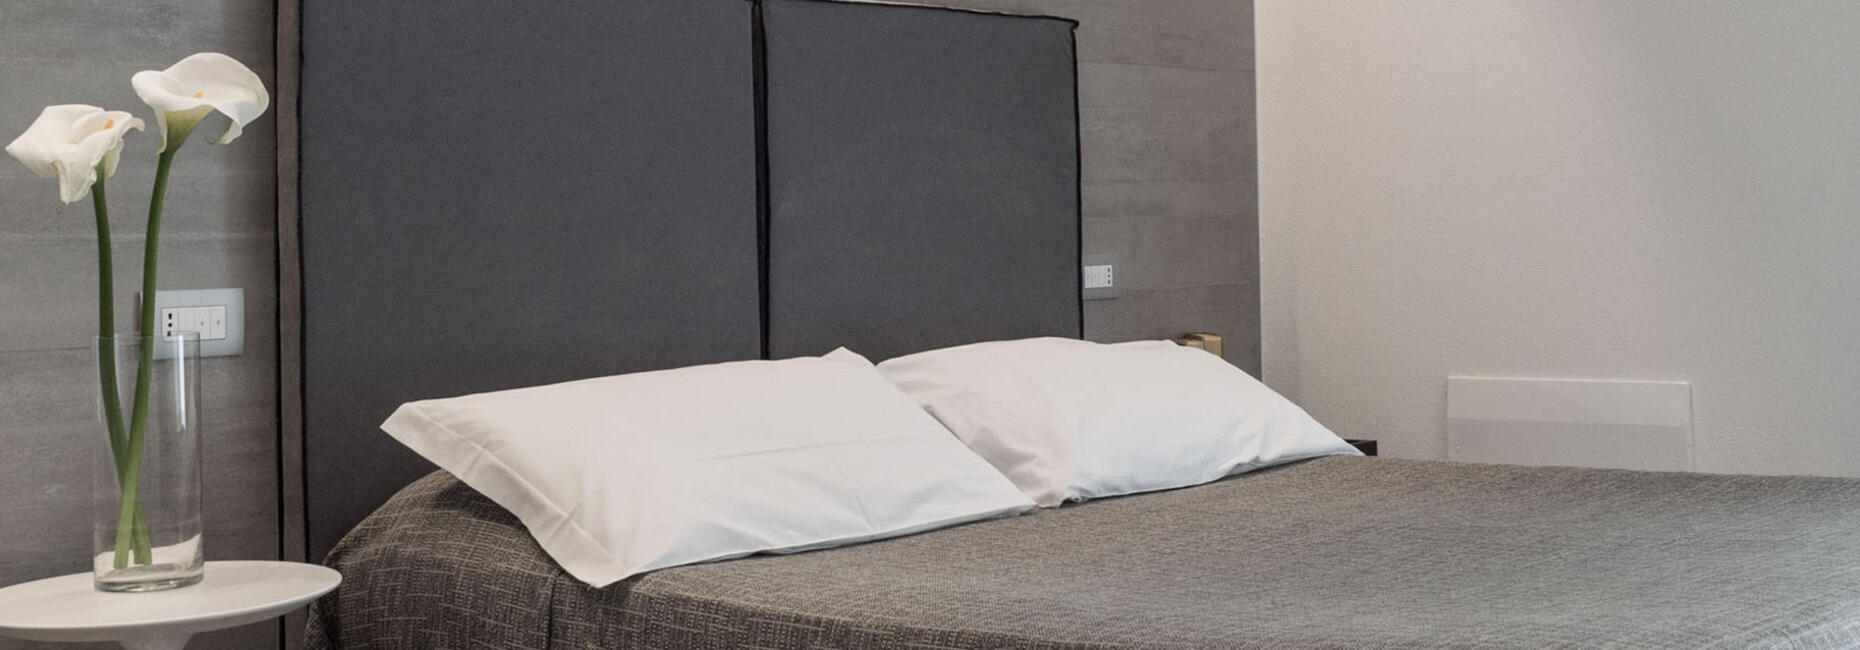 hotelcommodore fr chambres-hotel-cervia 011